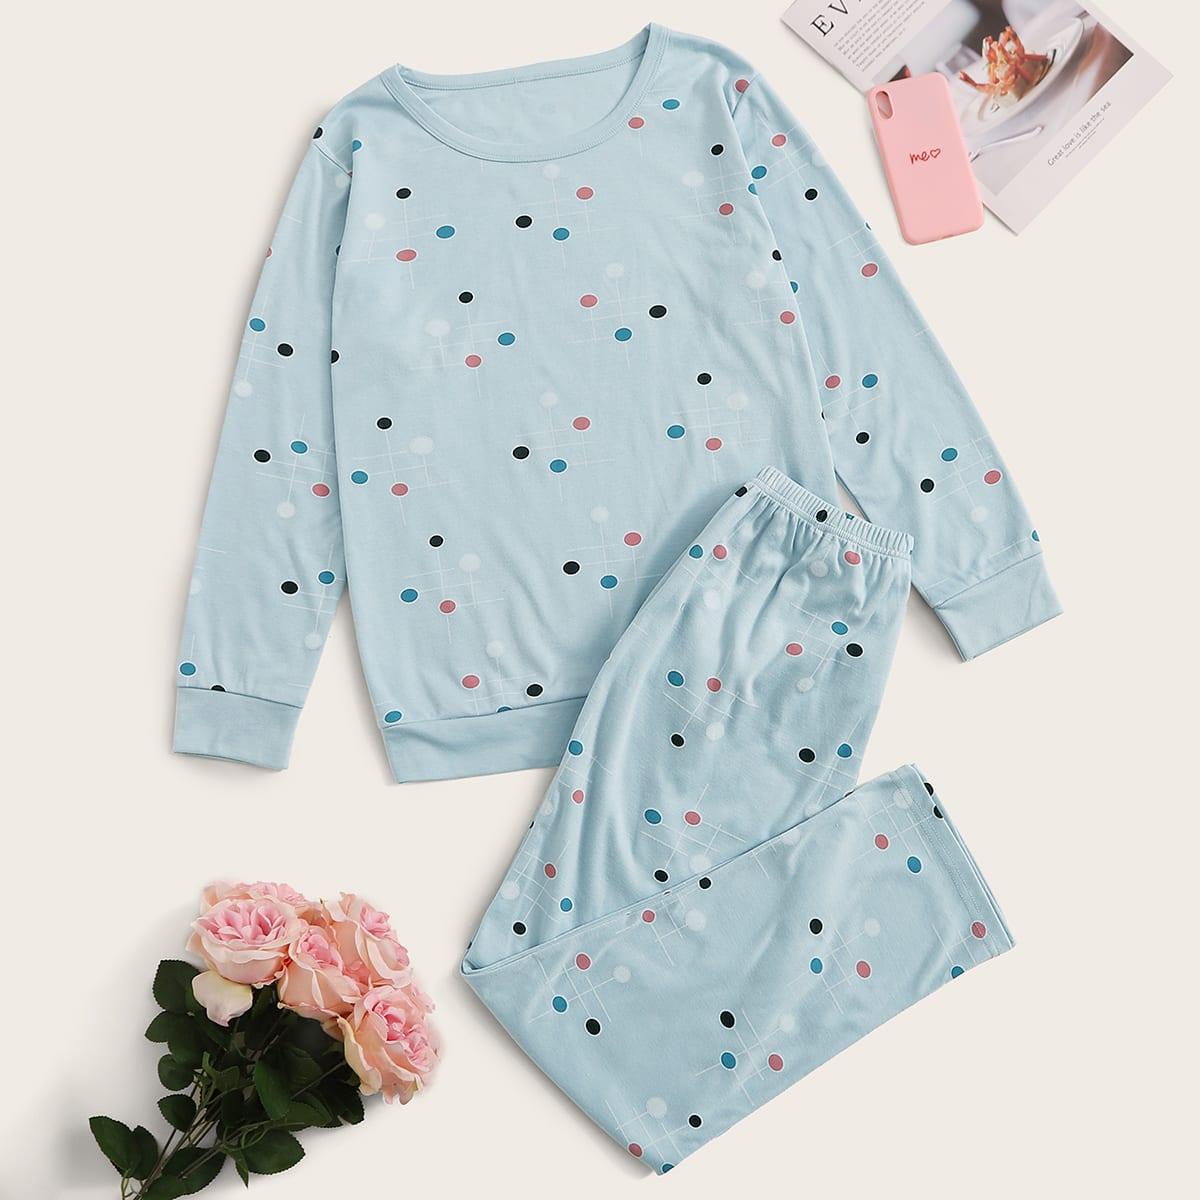 Blauw Casual Stippen Lounge kleding